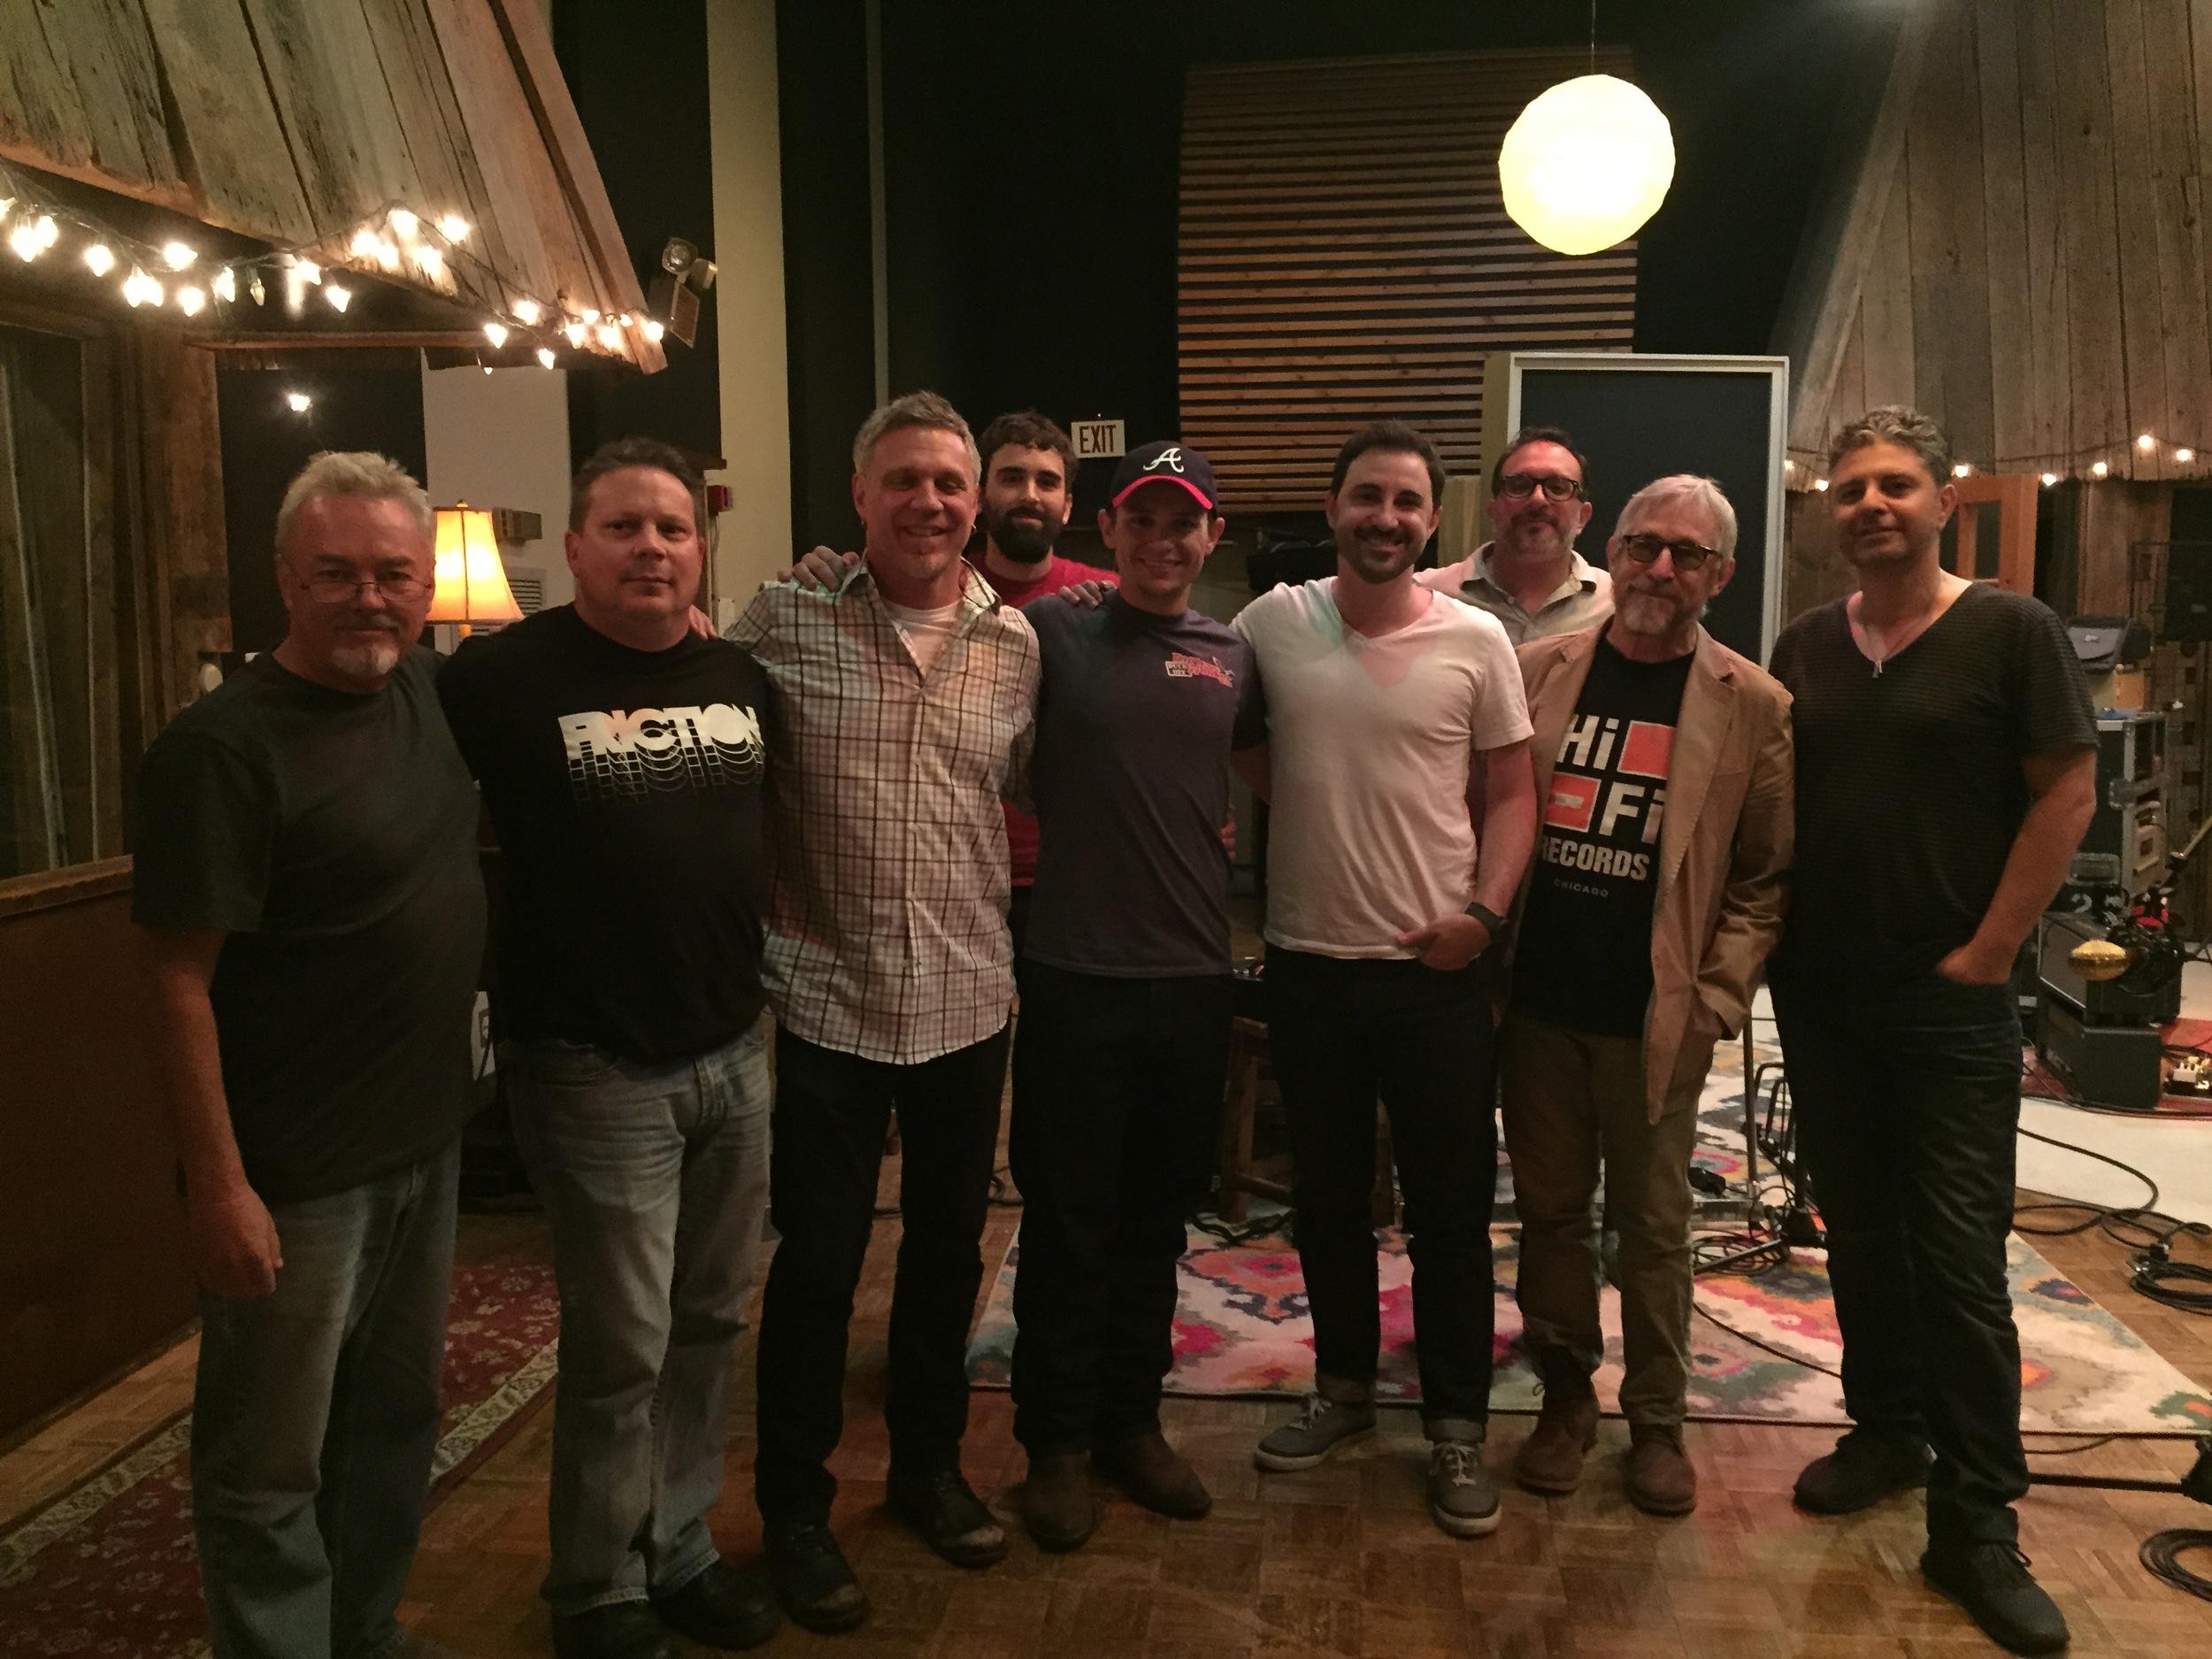 Left To Right | Billy Chapin(Producer), Sean Impera(Agent), Rob Hajacos(Fiddle), Gordon Hammond(Engineer), Johnny Reed Foley, Derek Wells(Guitar), Tim Marks(Bass), Russ Pahl(Steel) & Nir.Z(Drums)